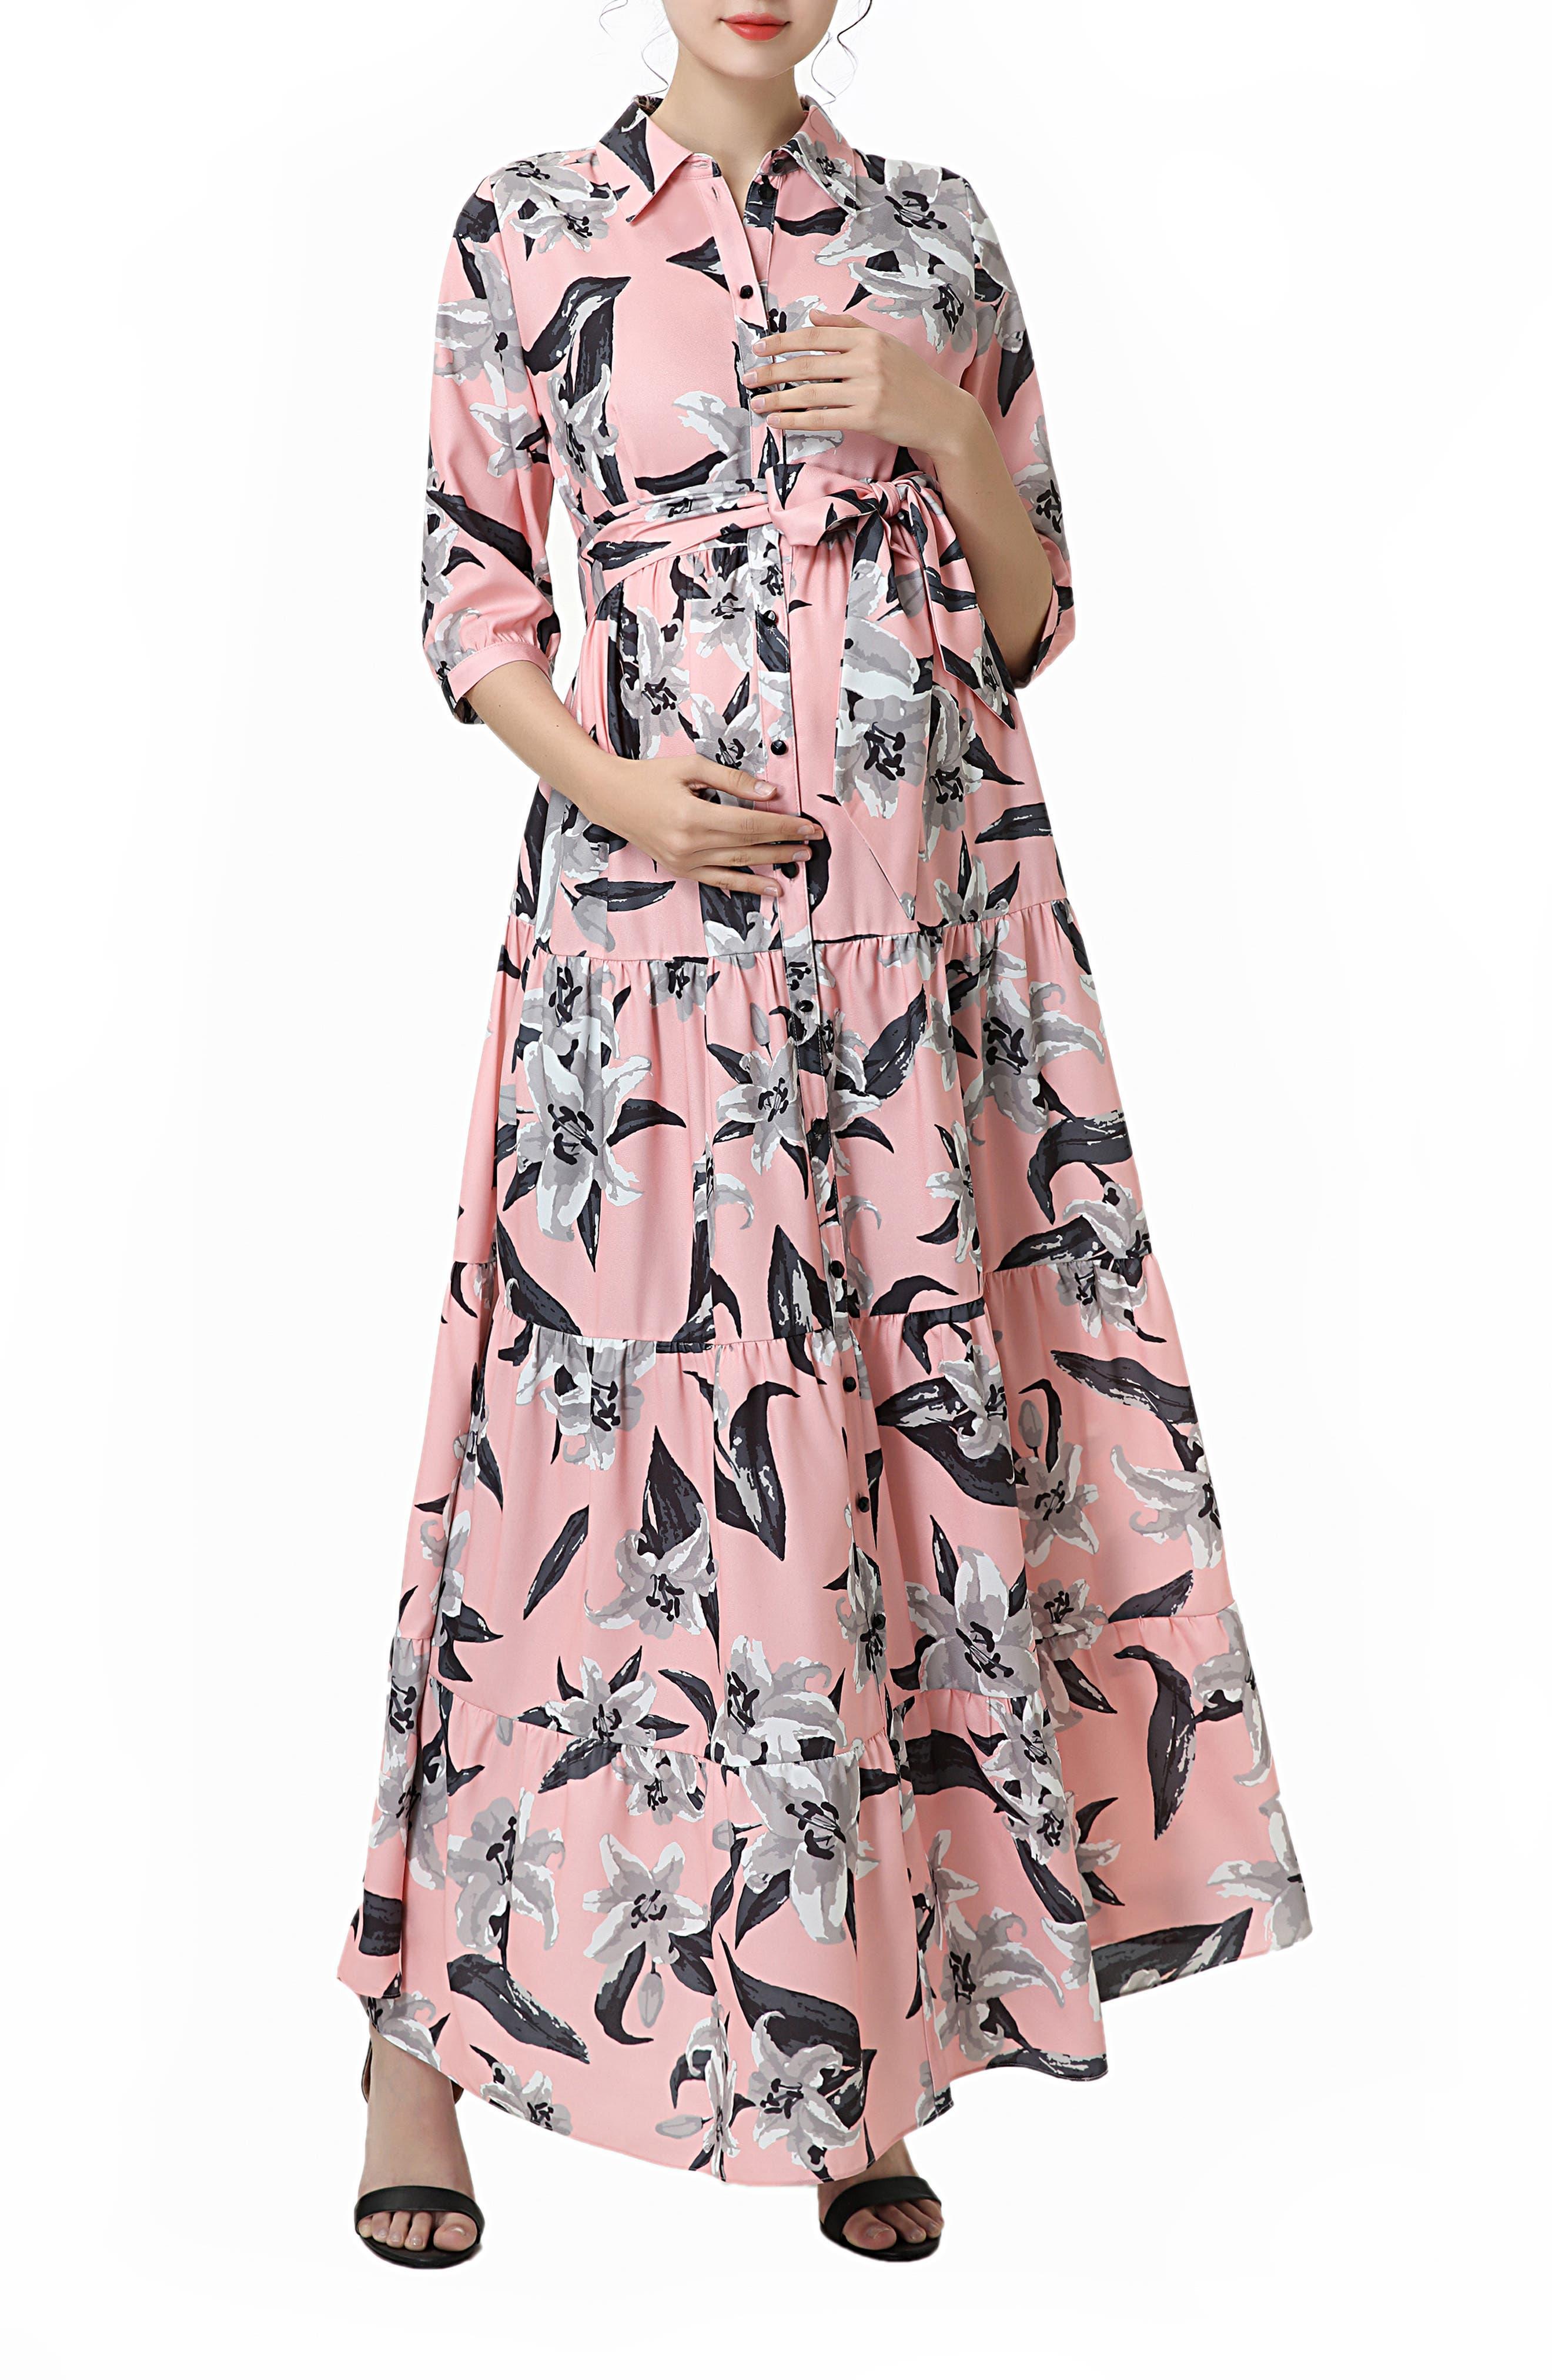 Cora Floral Belted Maternity/nursing Maxi Dress